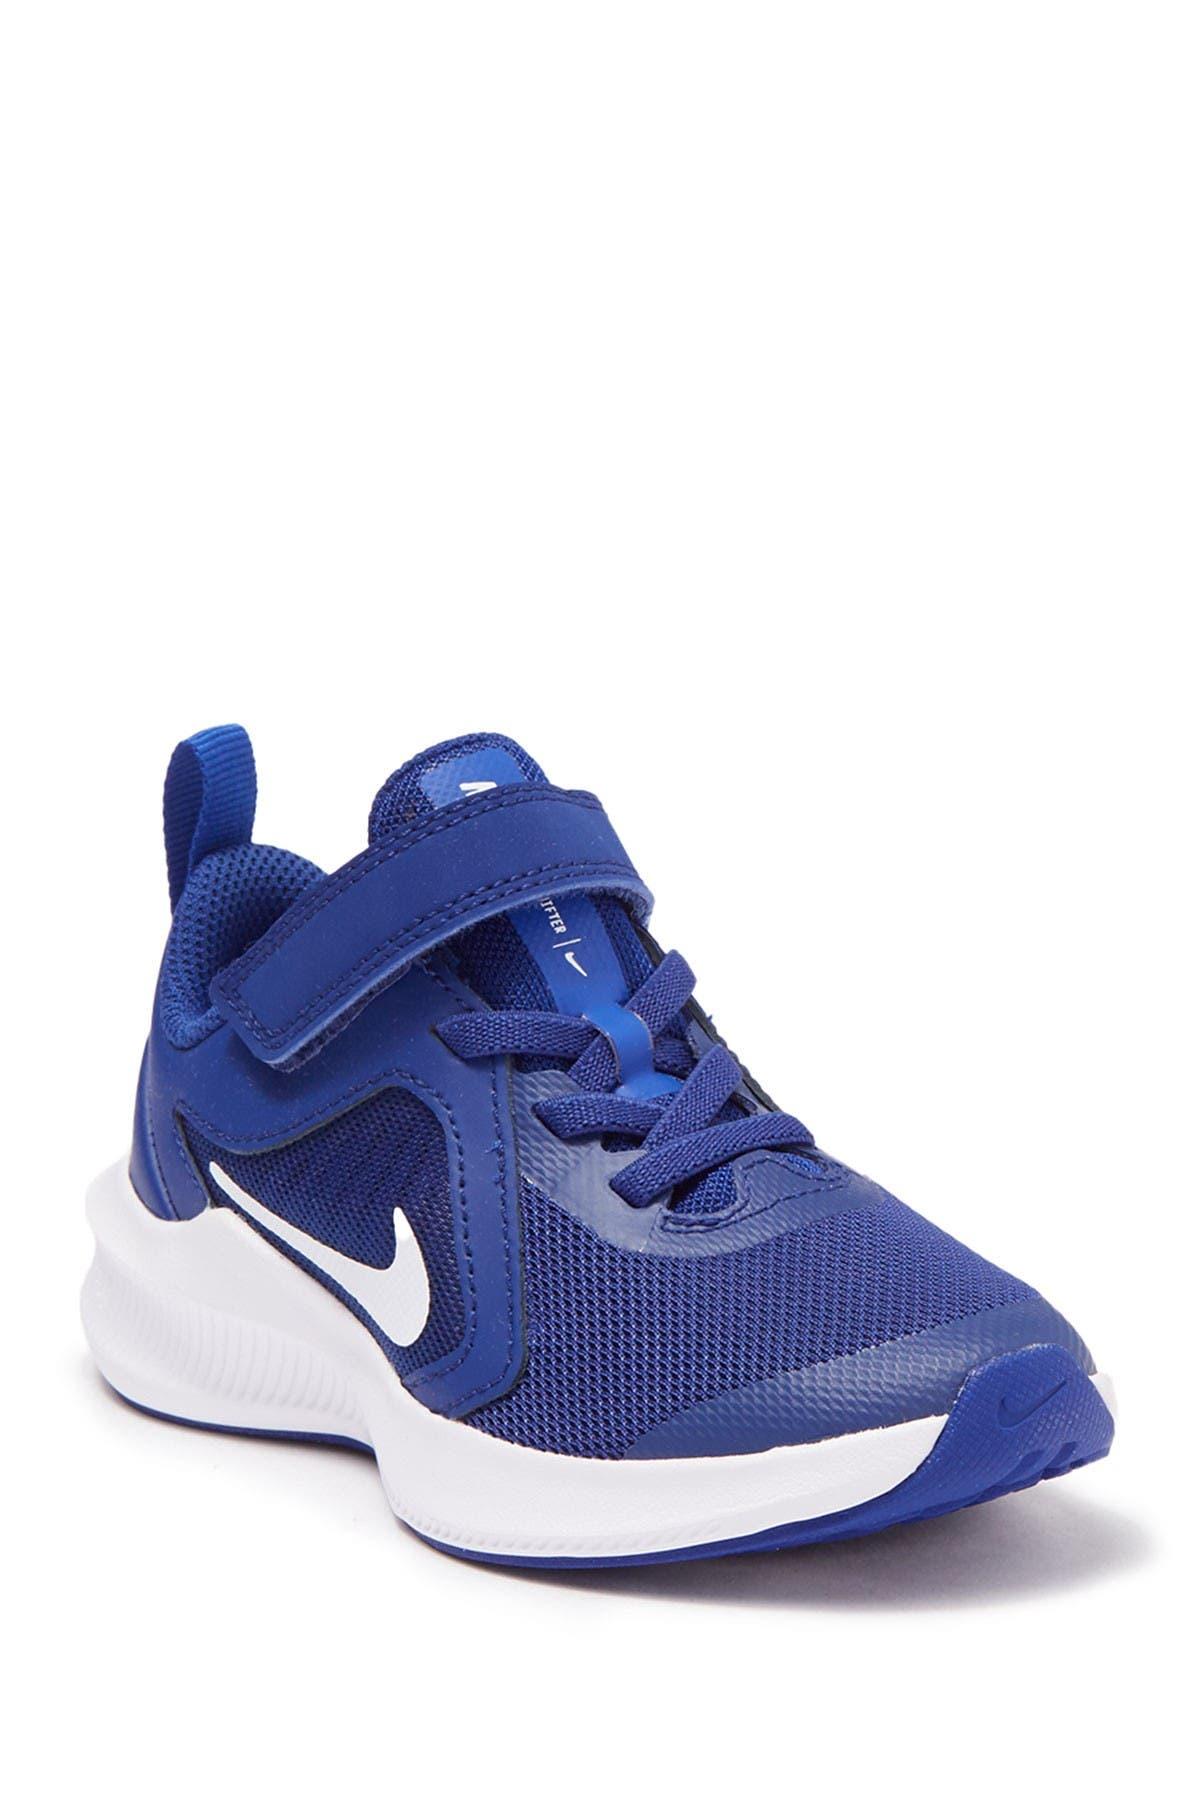 Boys' Shoes   Nordstrom Rack